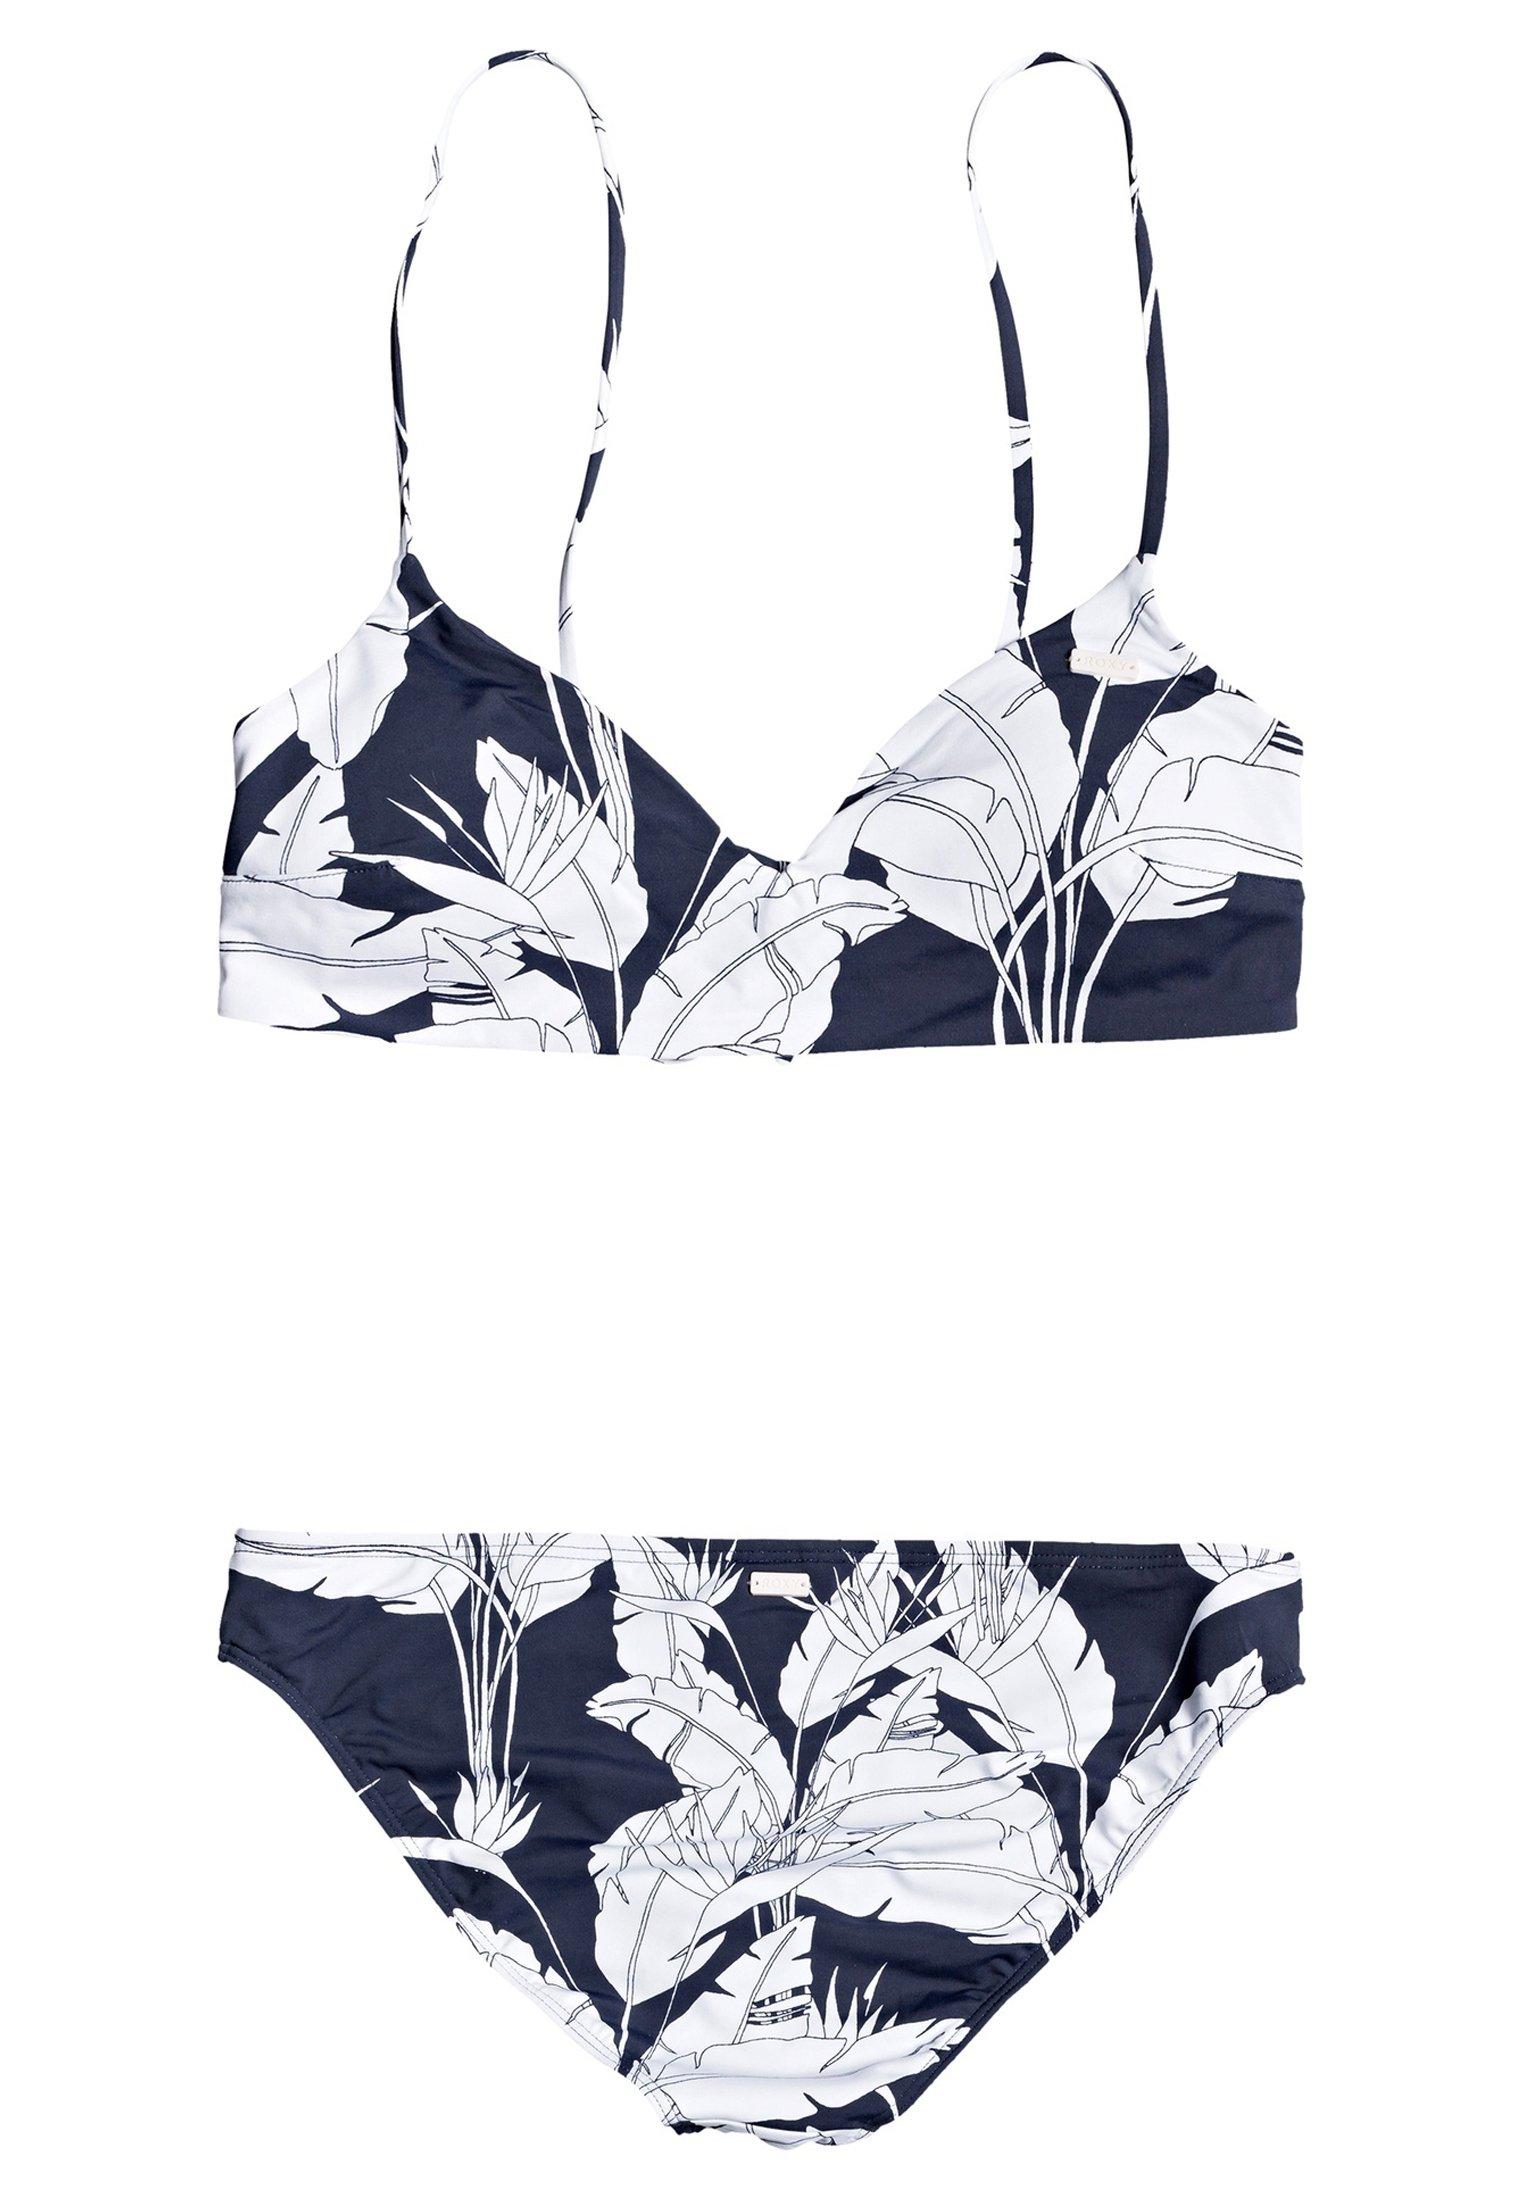 Roxy Roxy™ Printed Beach Classics - Athletic-bikini-set Für Frauen Er Bikini Terra Cotta Flying Flowers S Black Friday